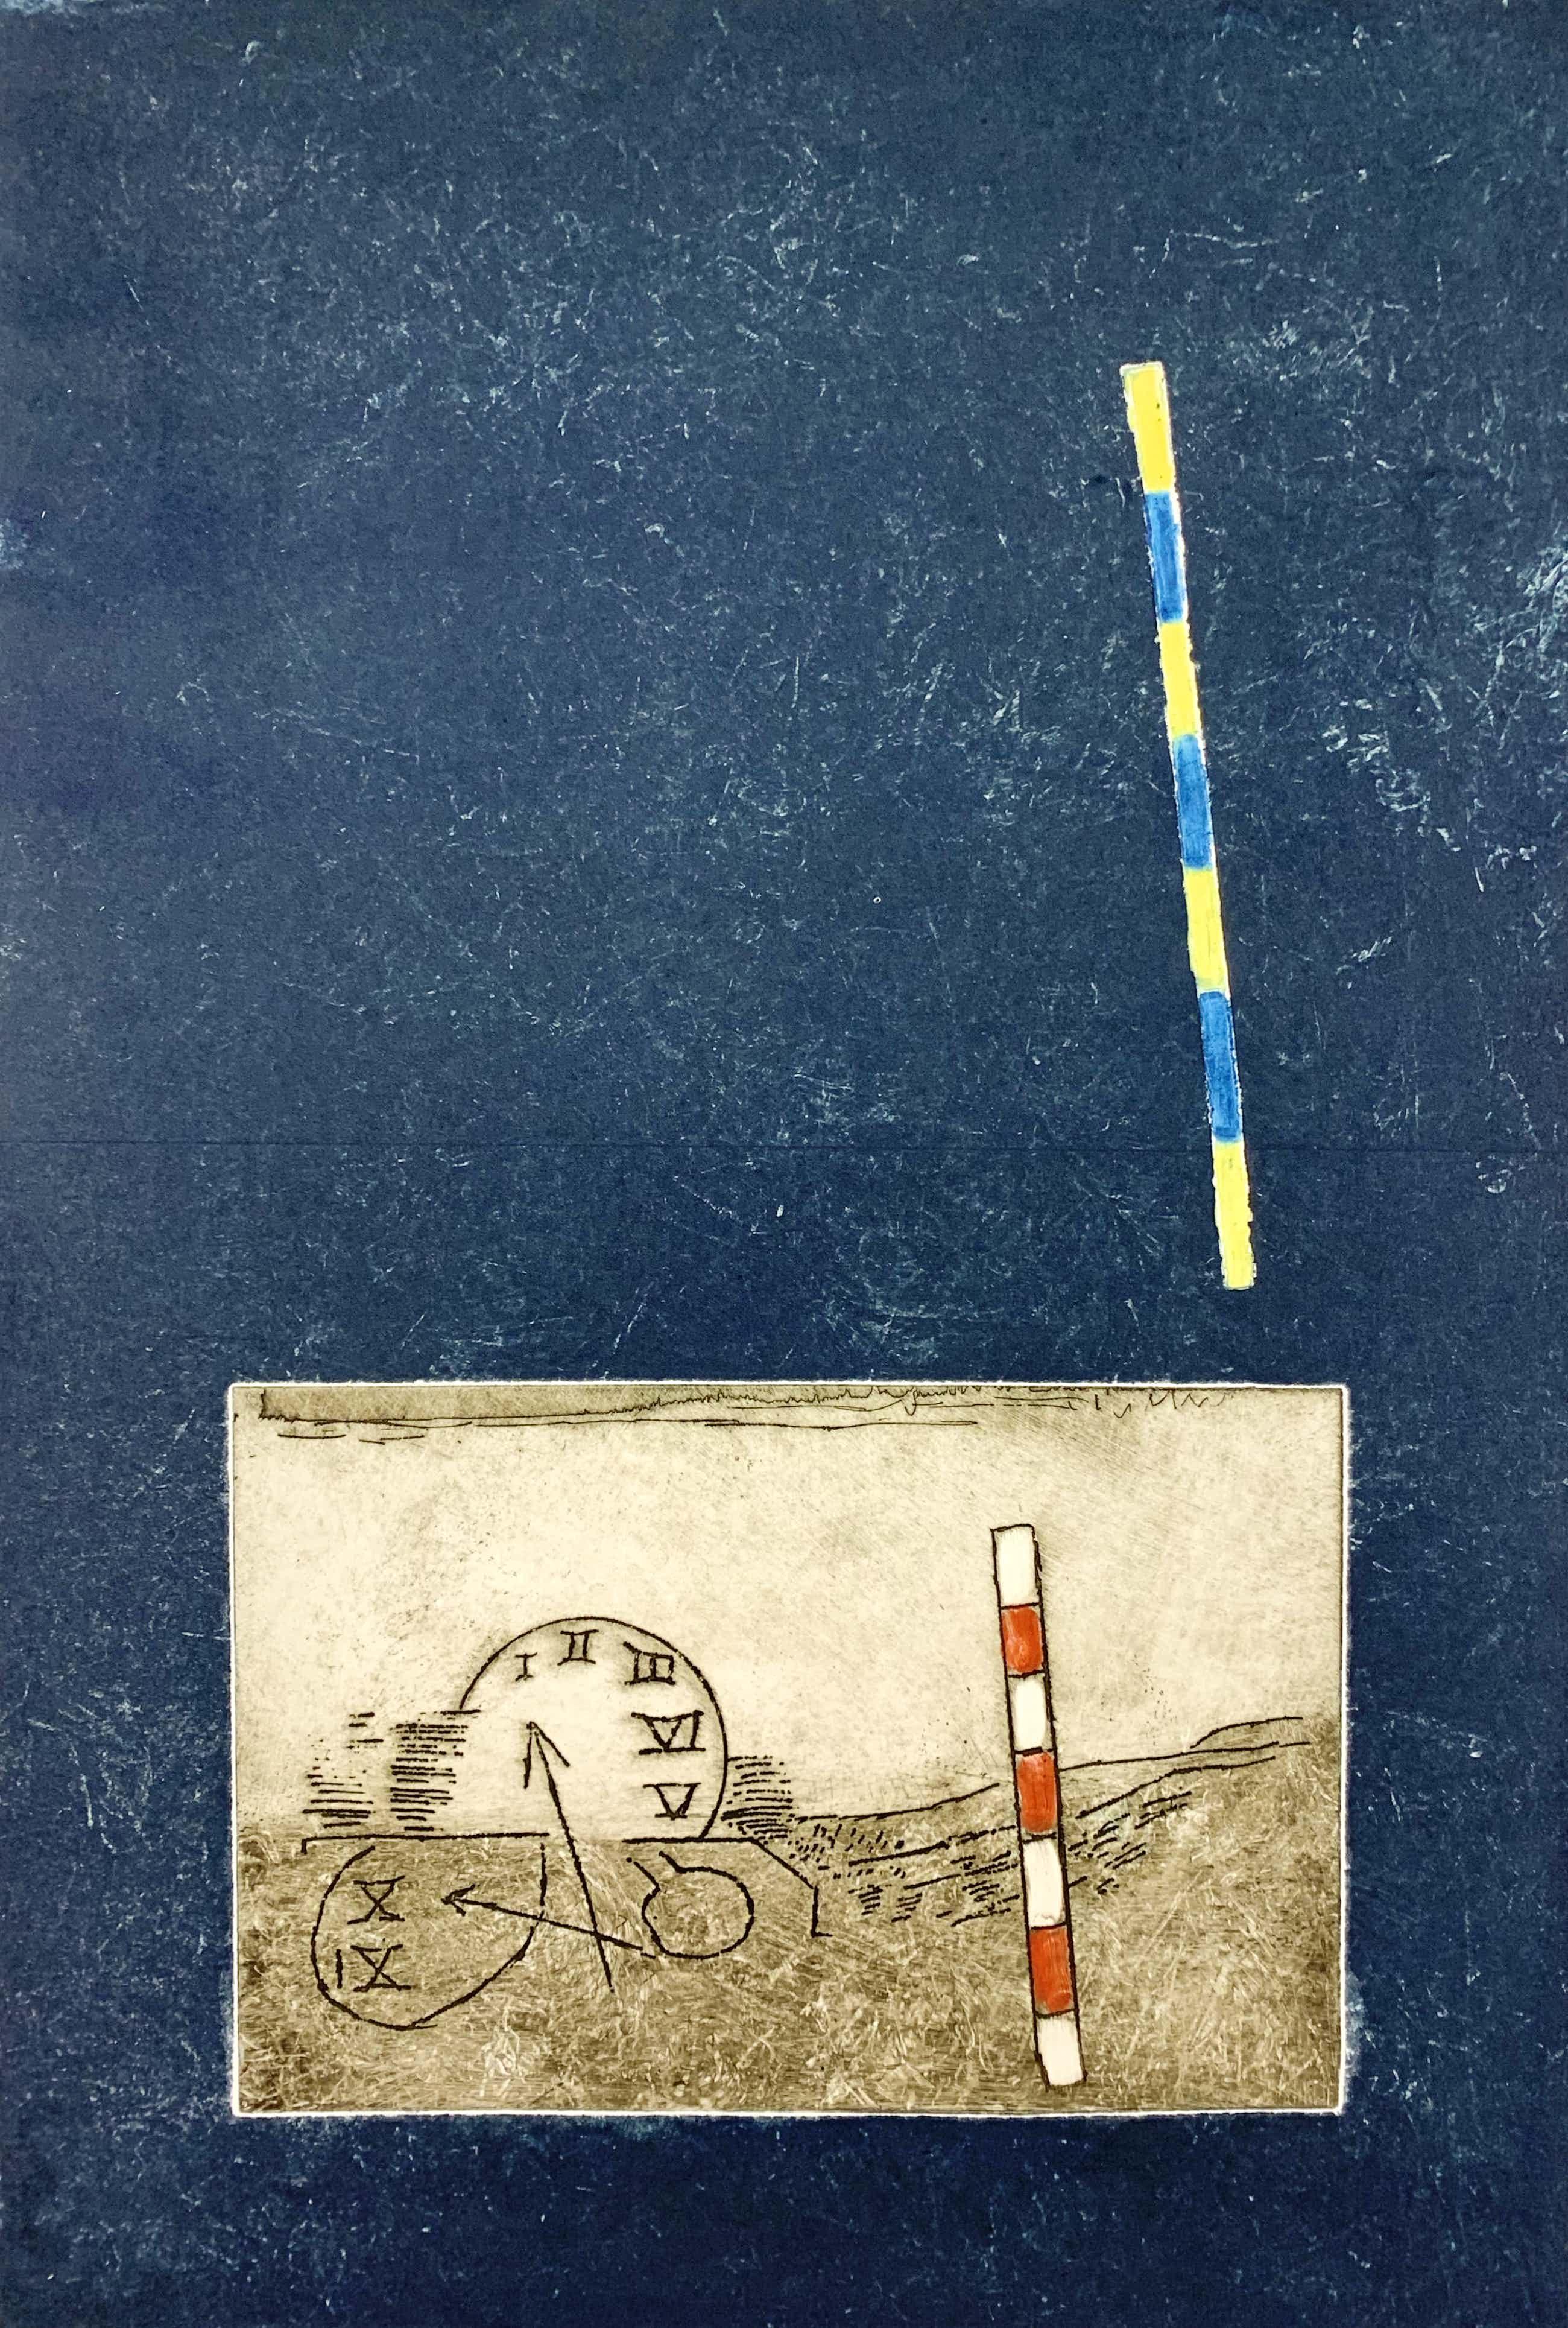 Jan Montyn - Kleurenets - 'La cage du temps II' - 1971 kopen? Bied vanaf 125!